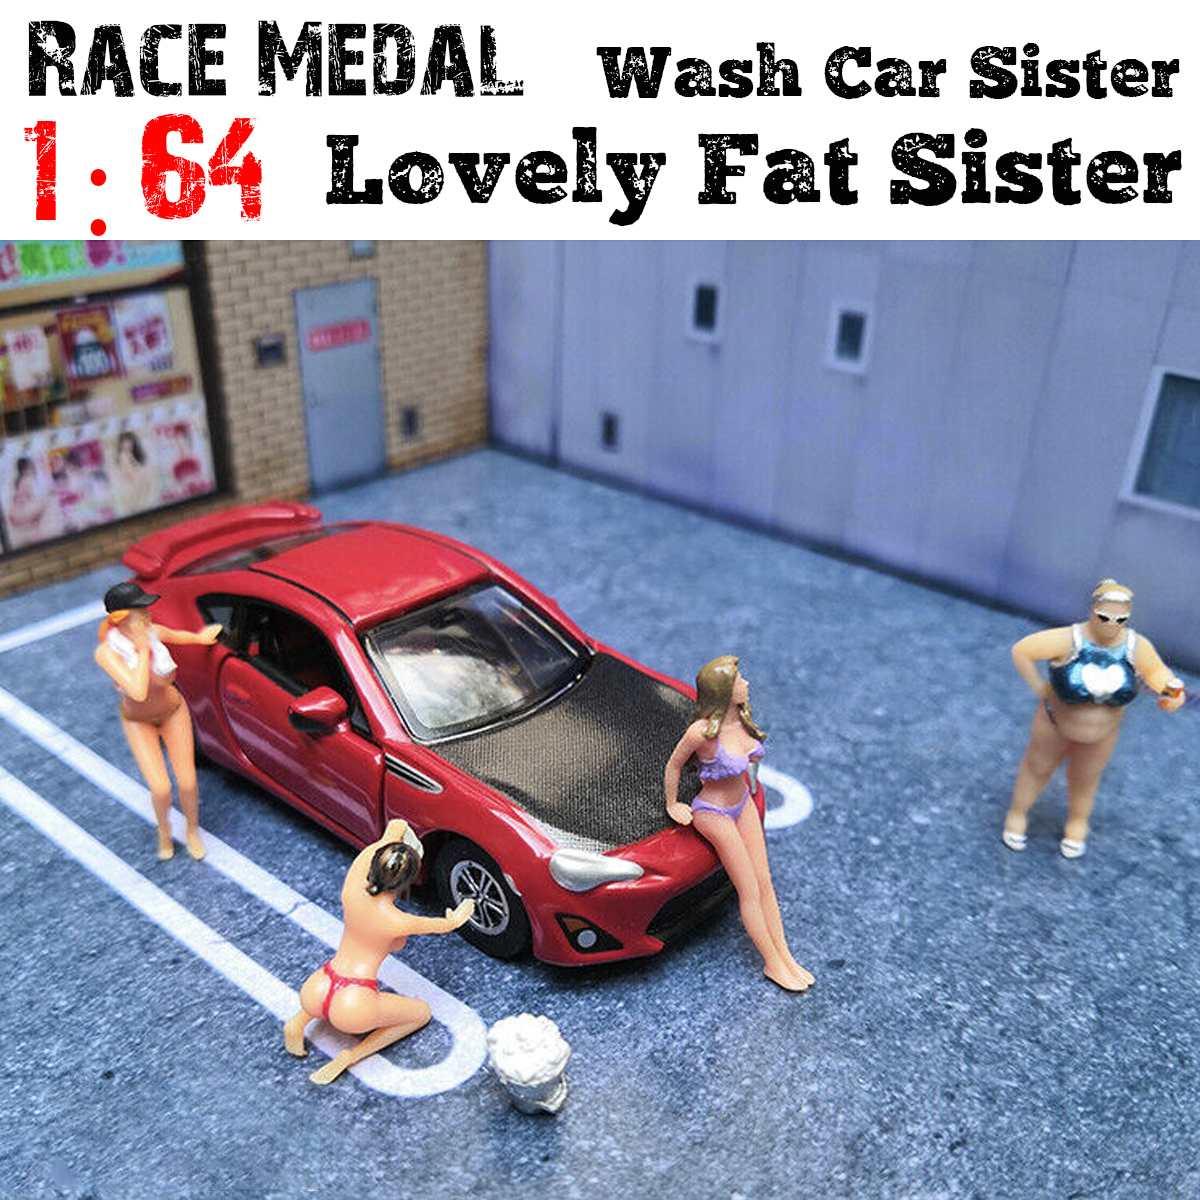 Race Medal 1:64 Figure Diorama Car Wash Sister Bikini Lovely Fat Sister Scenario Model For Matchbox For Model Lover Toys